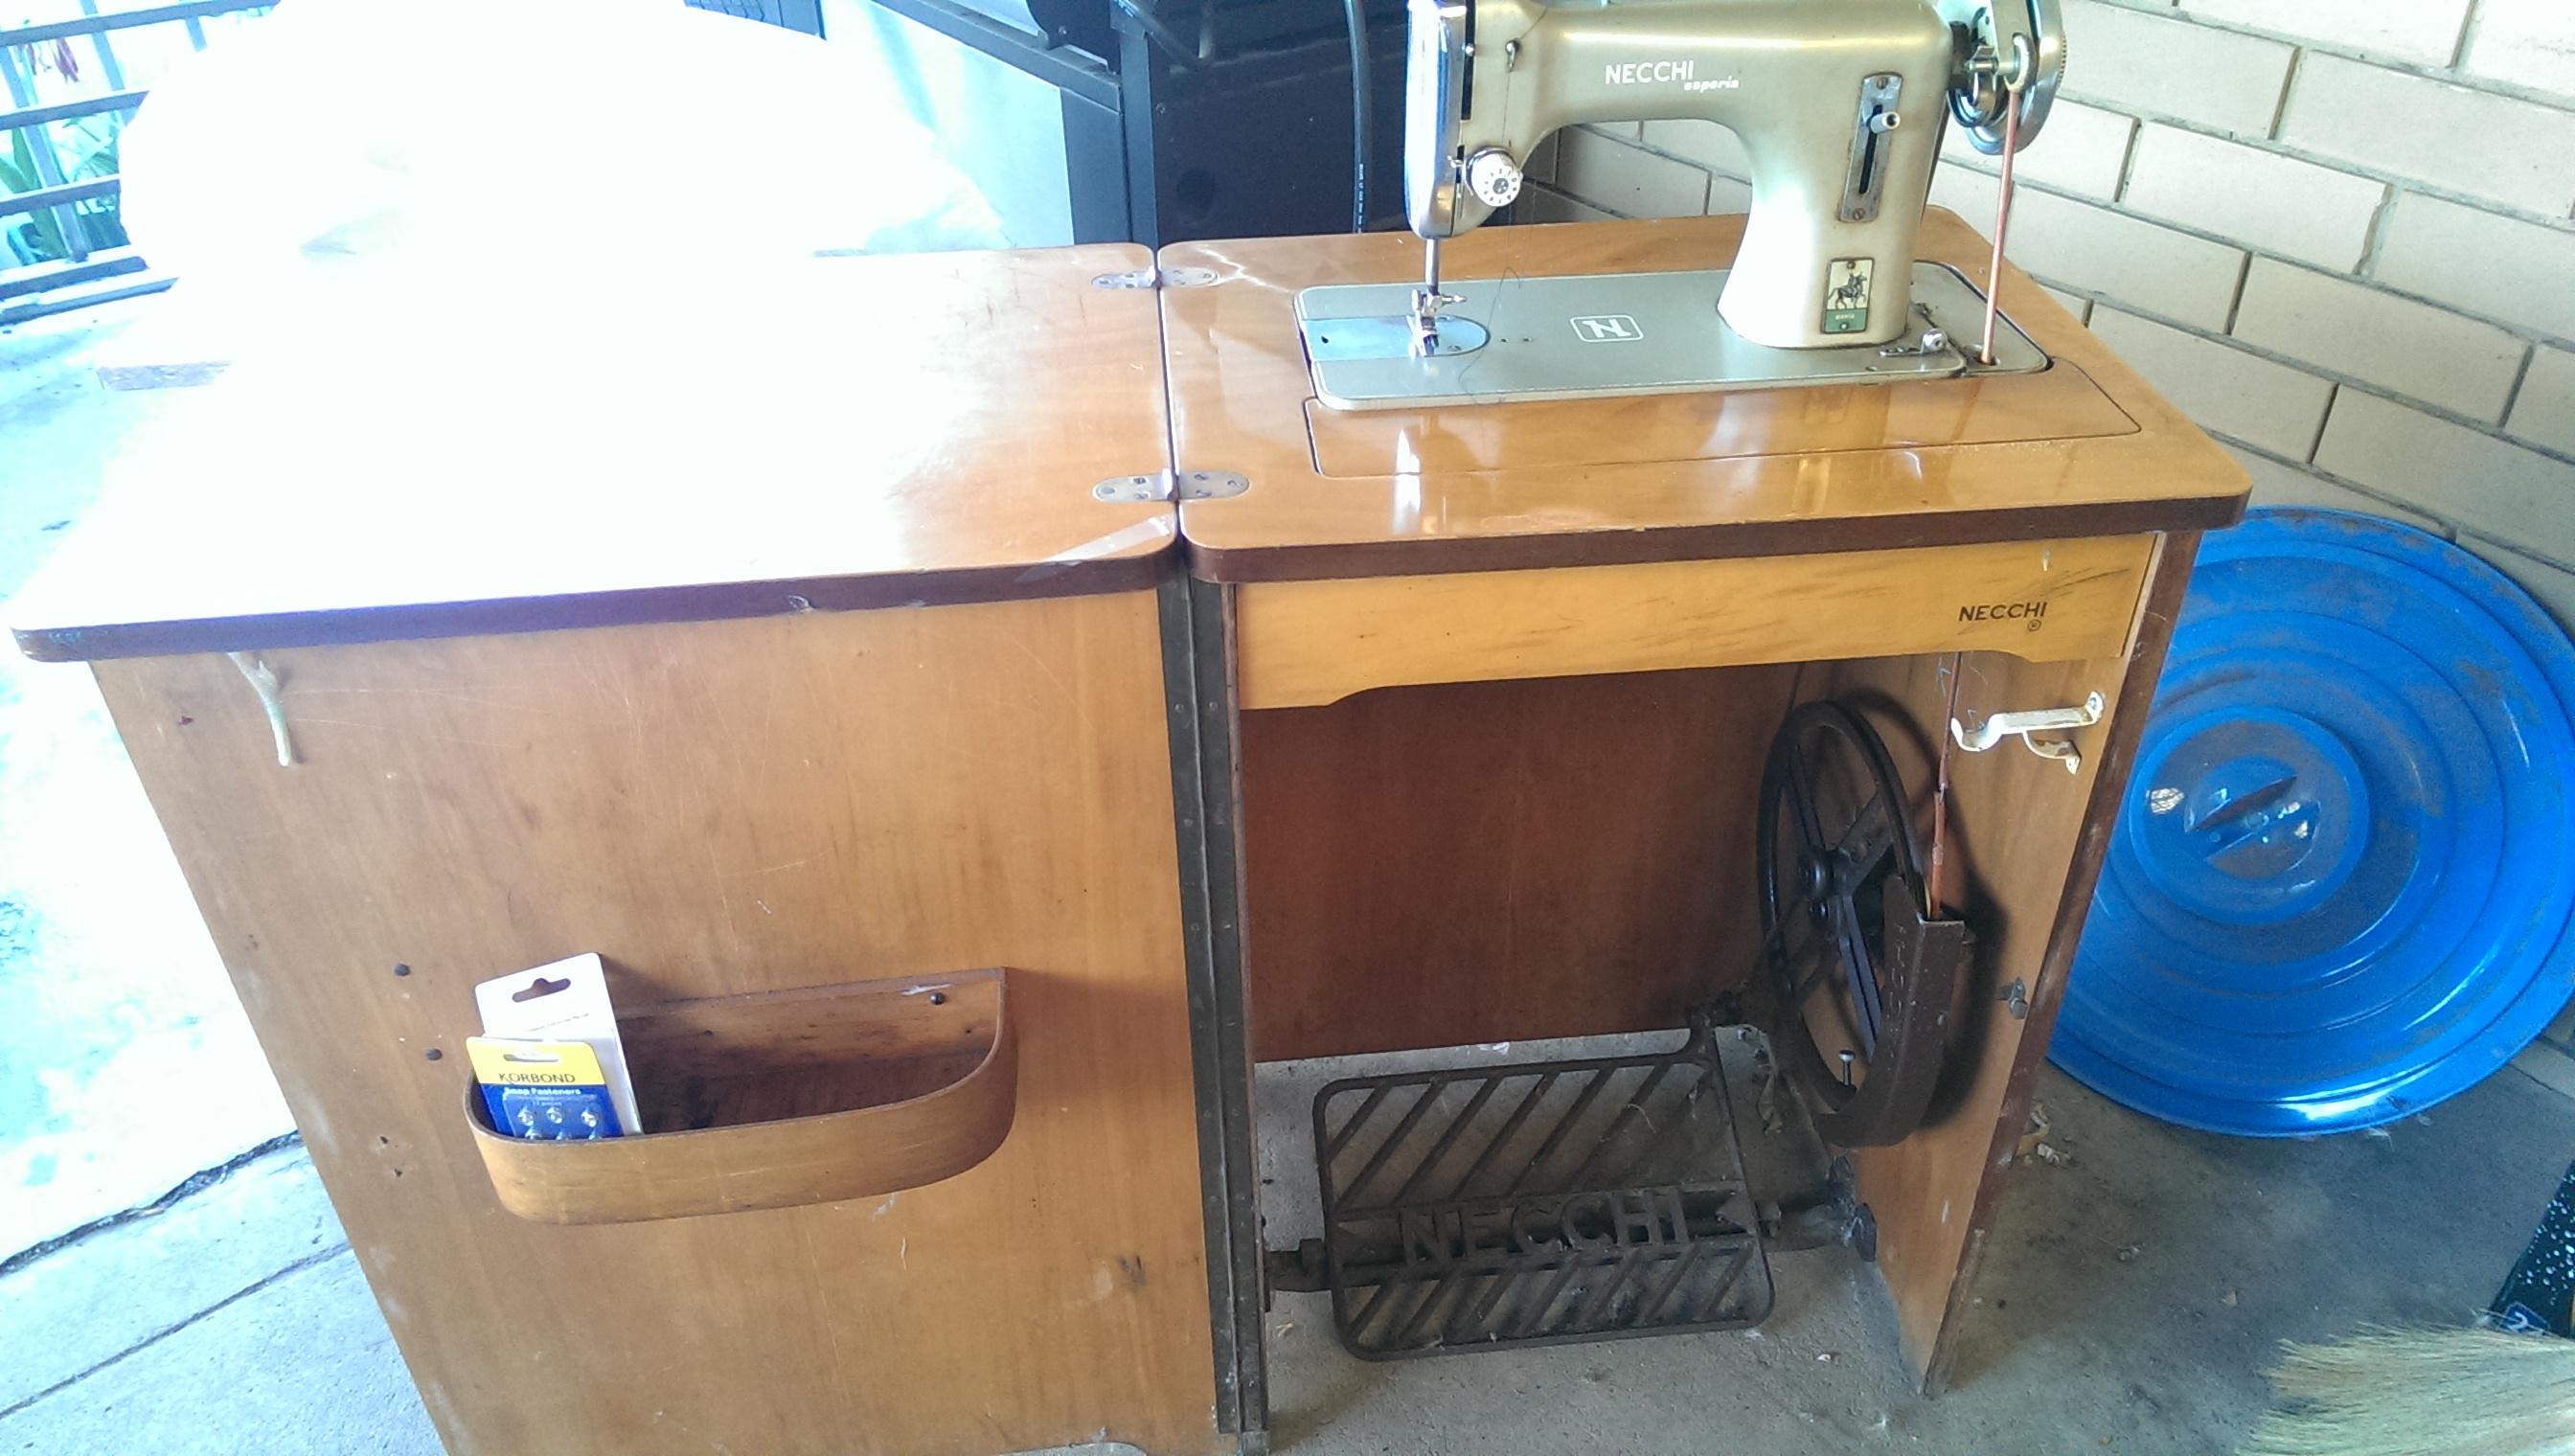 Necchi Esperia In Treadle Cabinet Supernova Sewing Machine Threading Diagram Vintage Name Imag0010 1 Views 1330 Size 9521 Kb